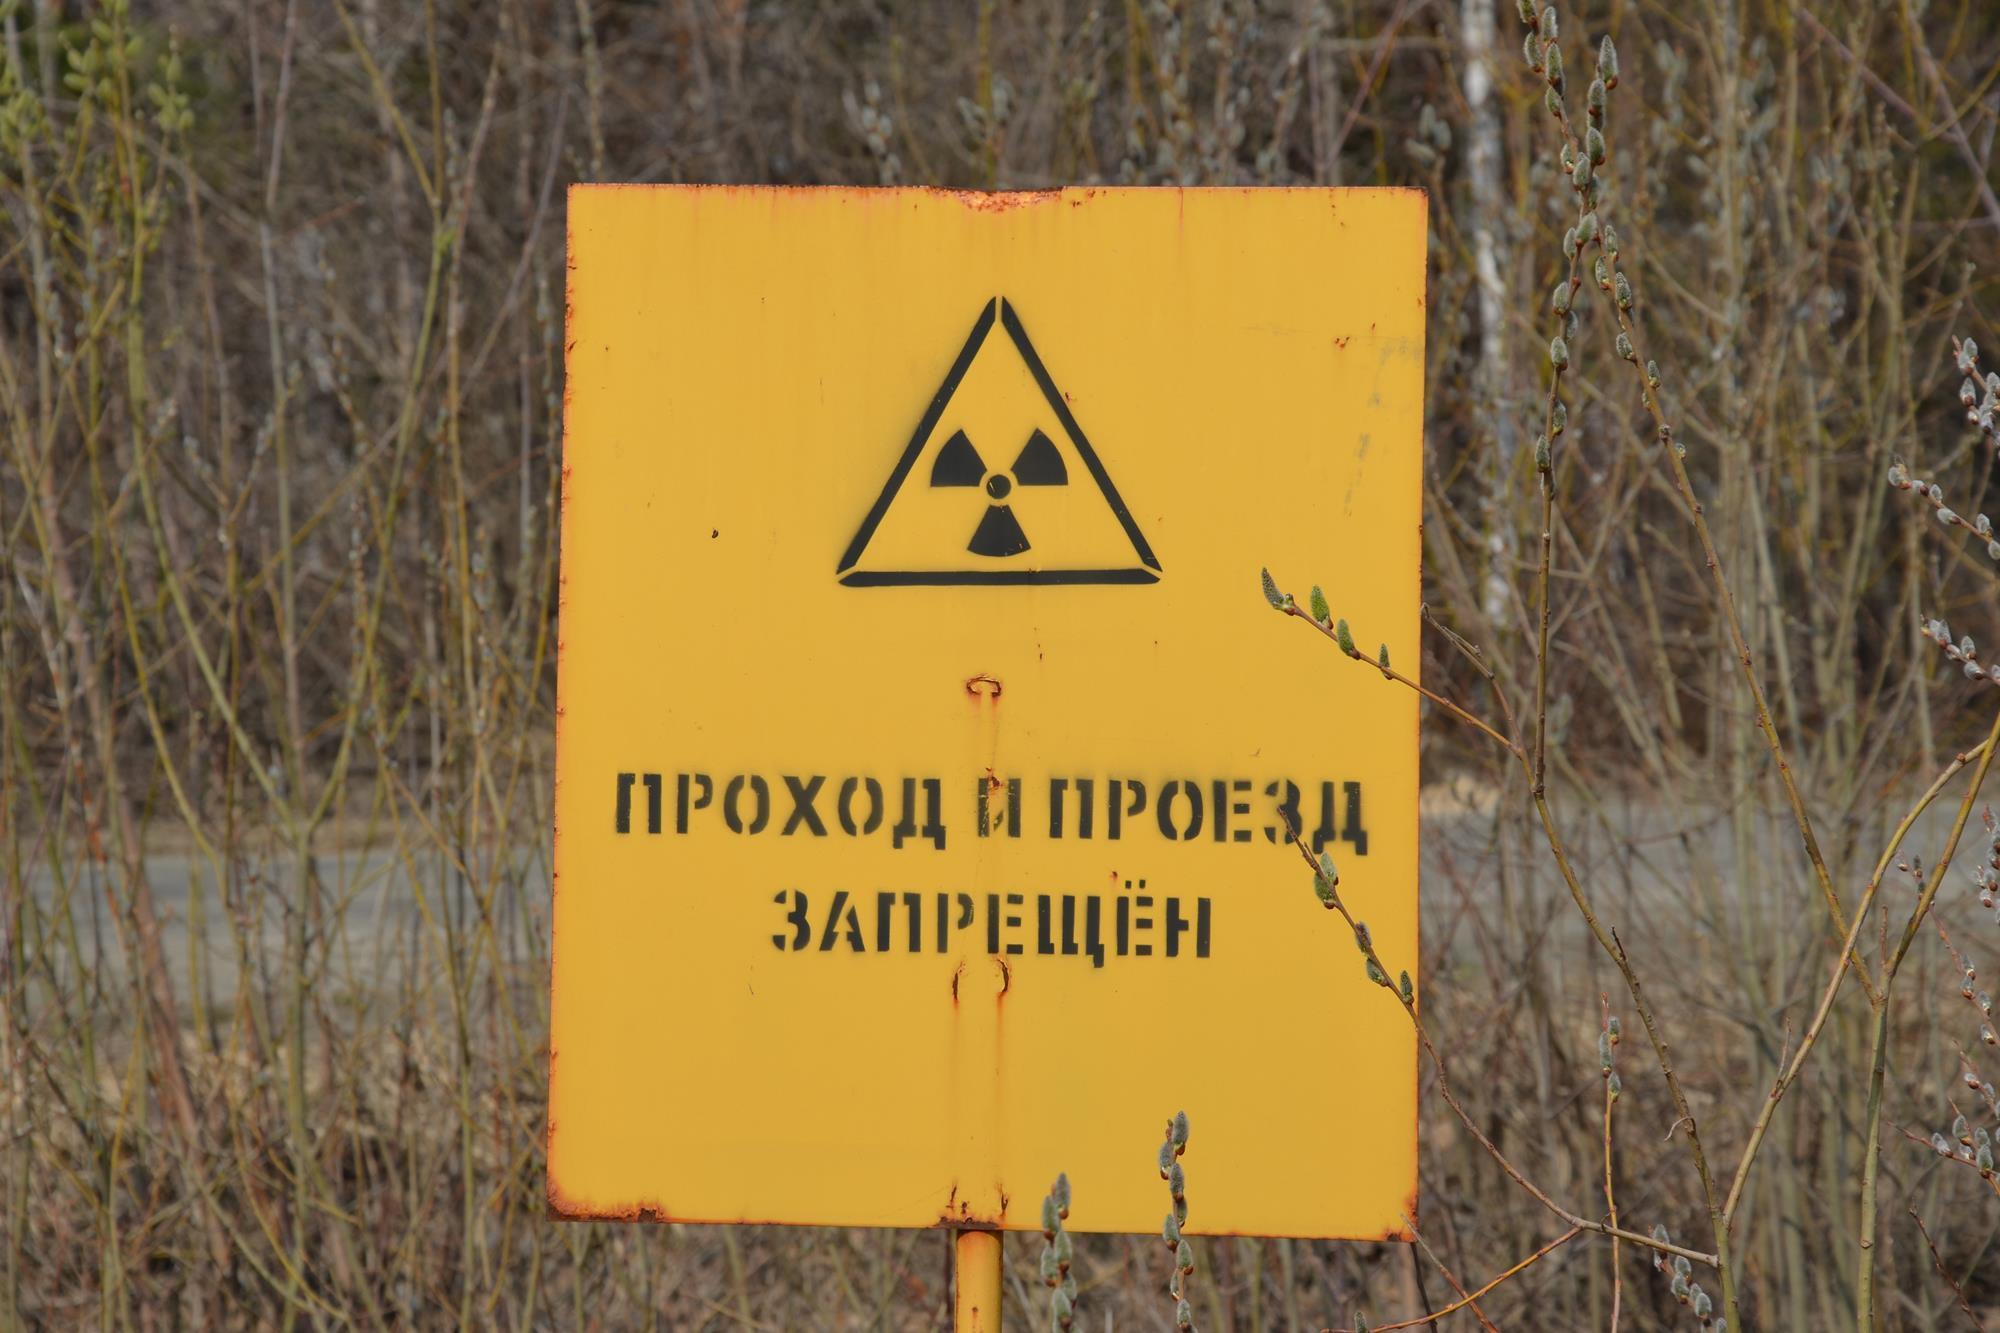 Polonium-210: A deadly element   News   Chemistry World